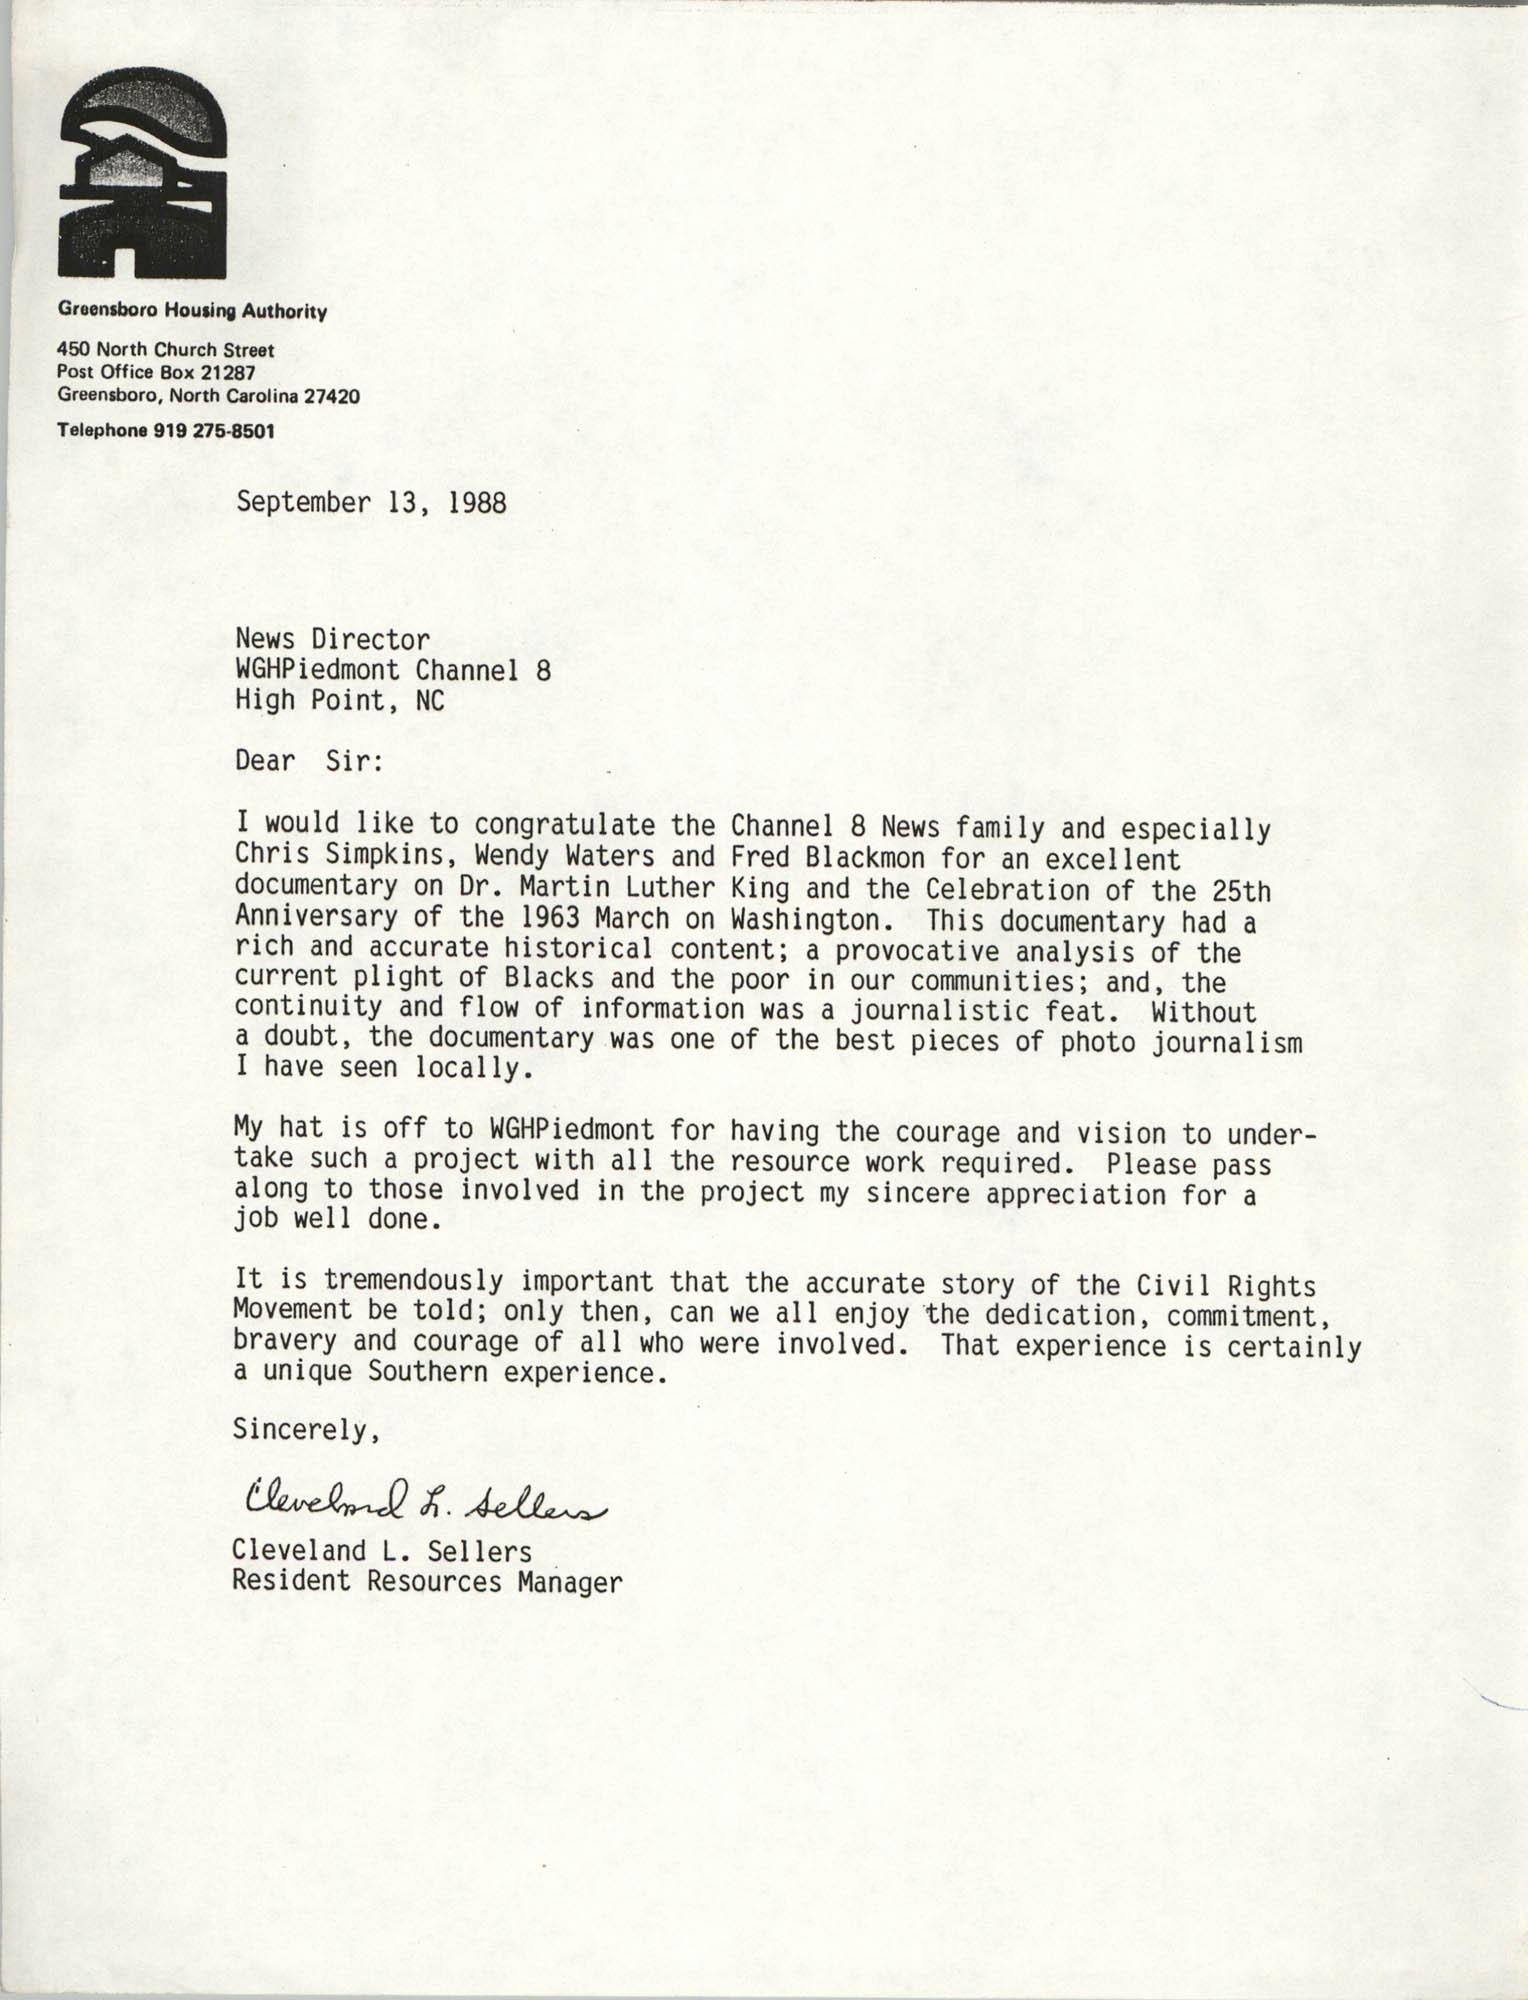 Letter from Cleveland Sellers, September 13, 1988